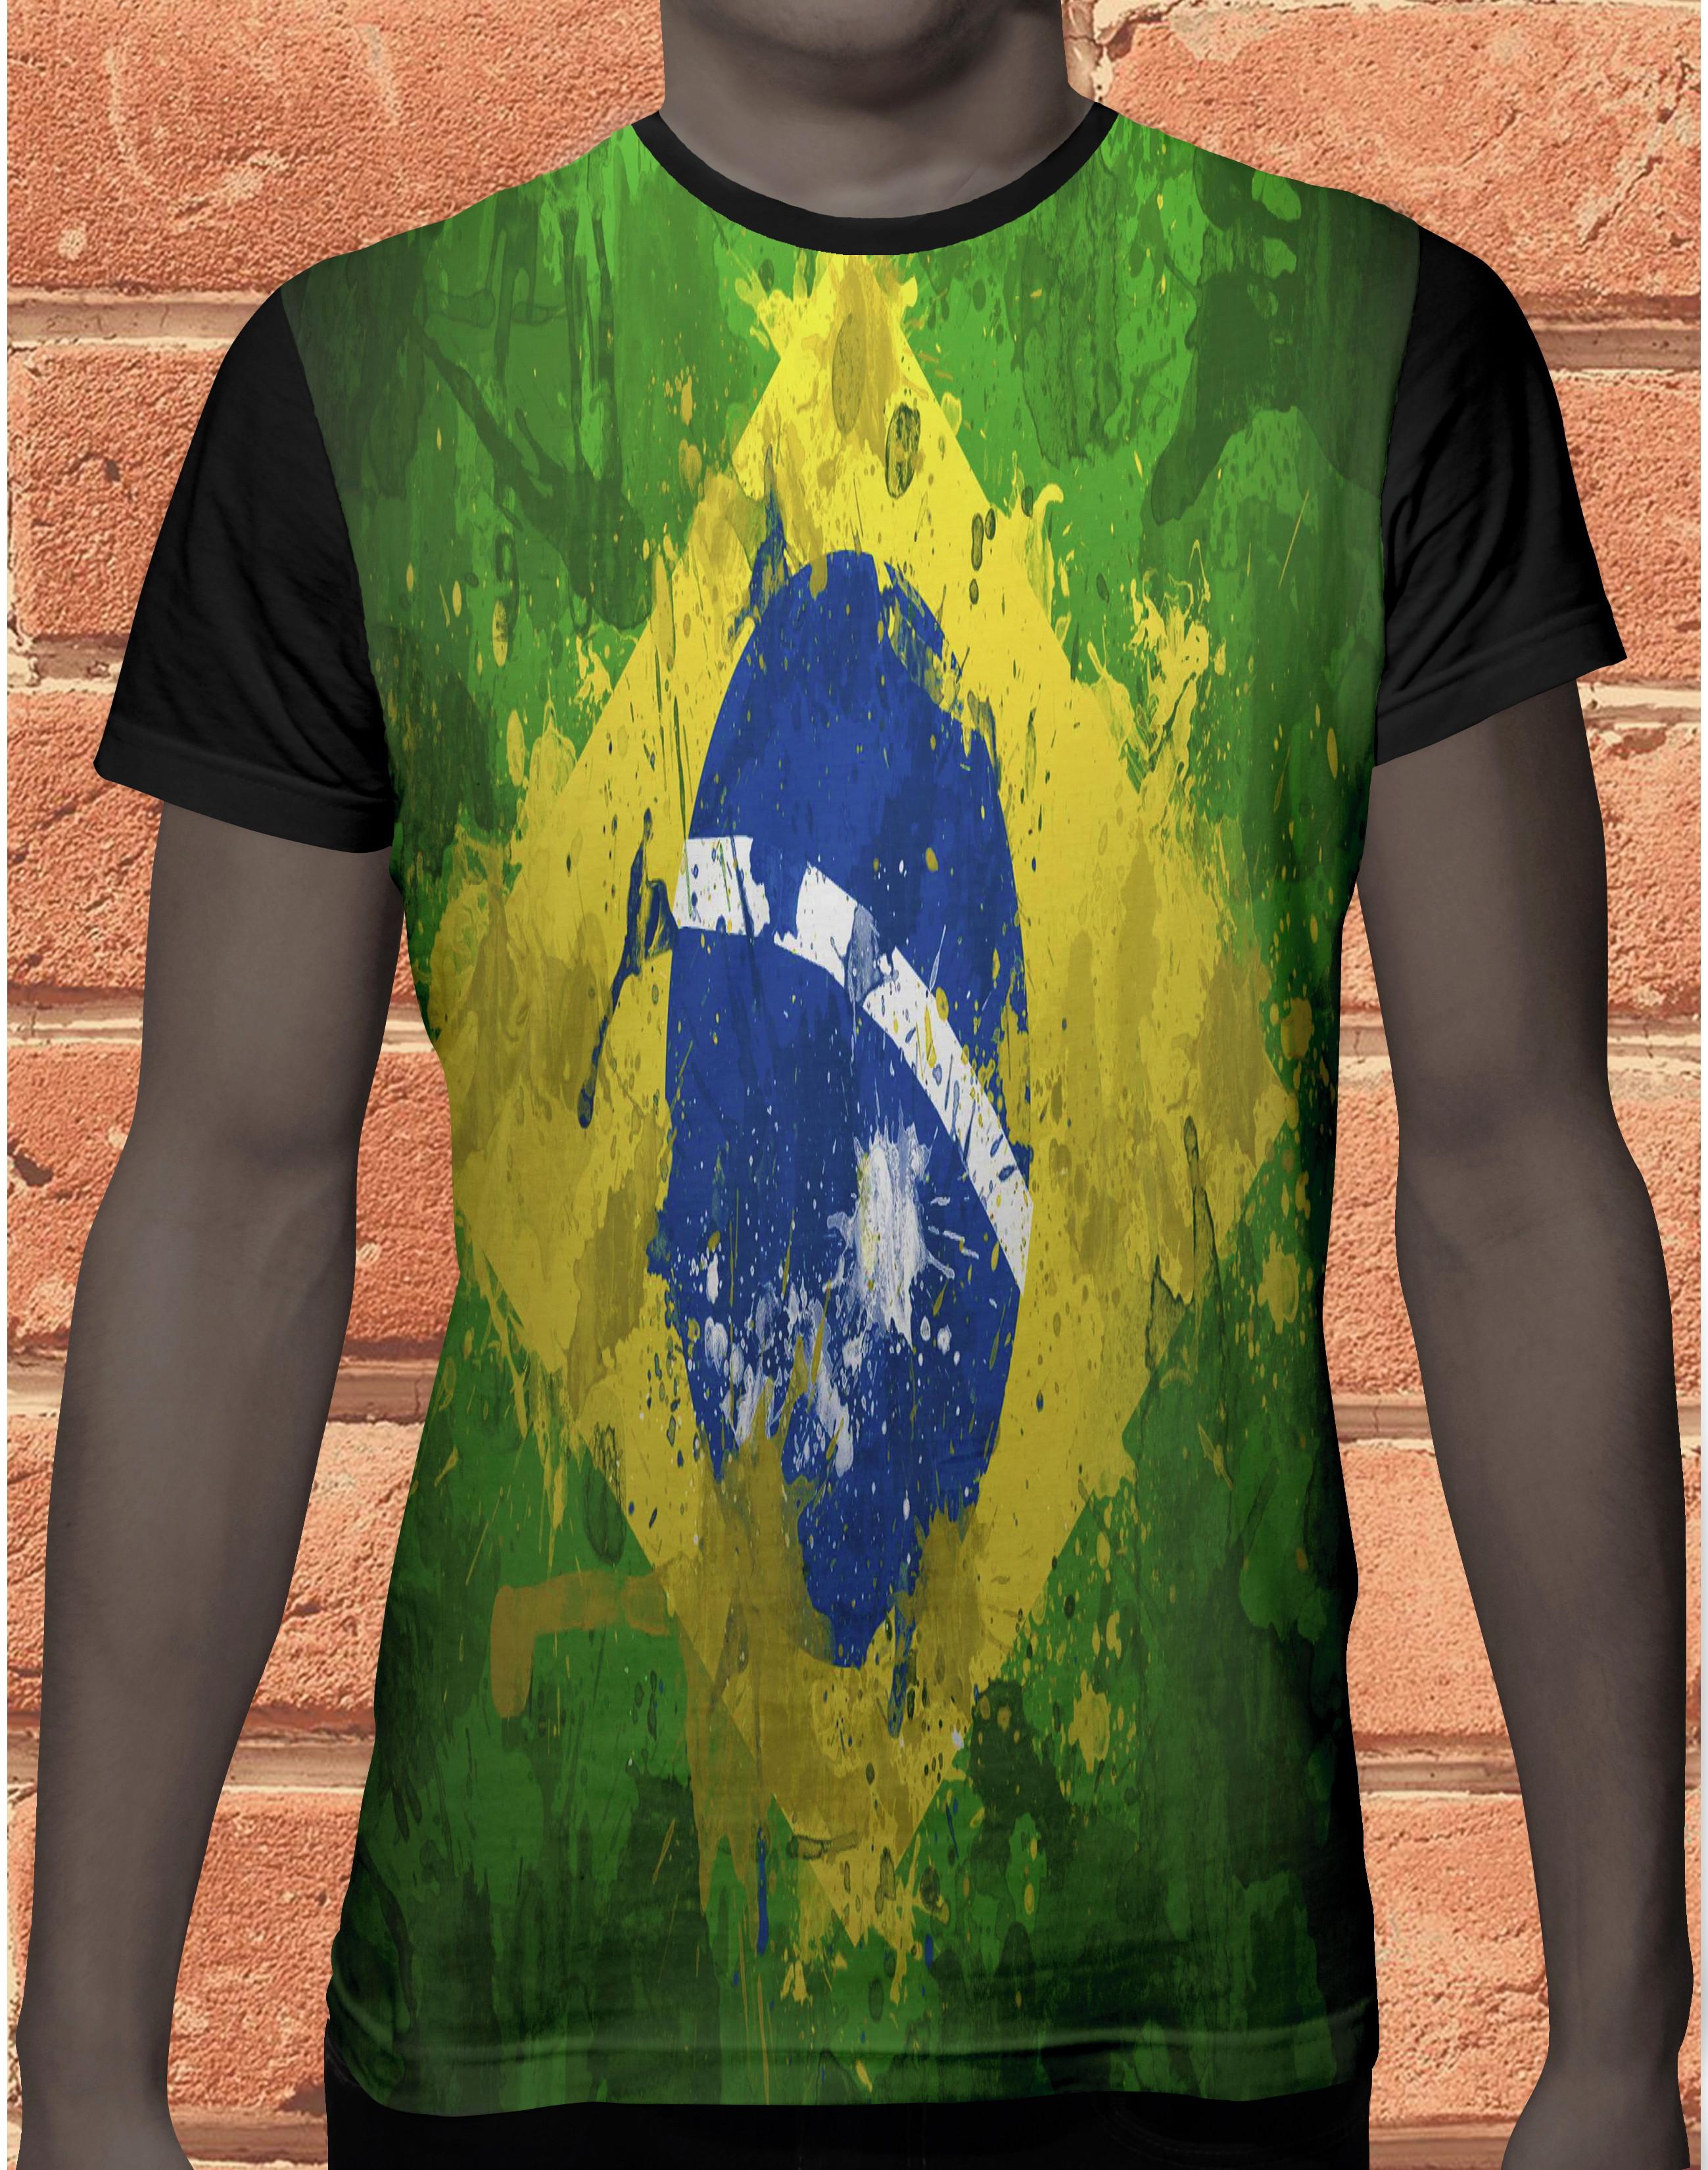 9266033ac Camiseta Camisa Bandeira Sao Paulo Brasil 891 no Elo7